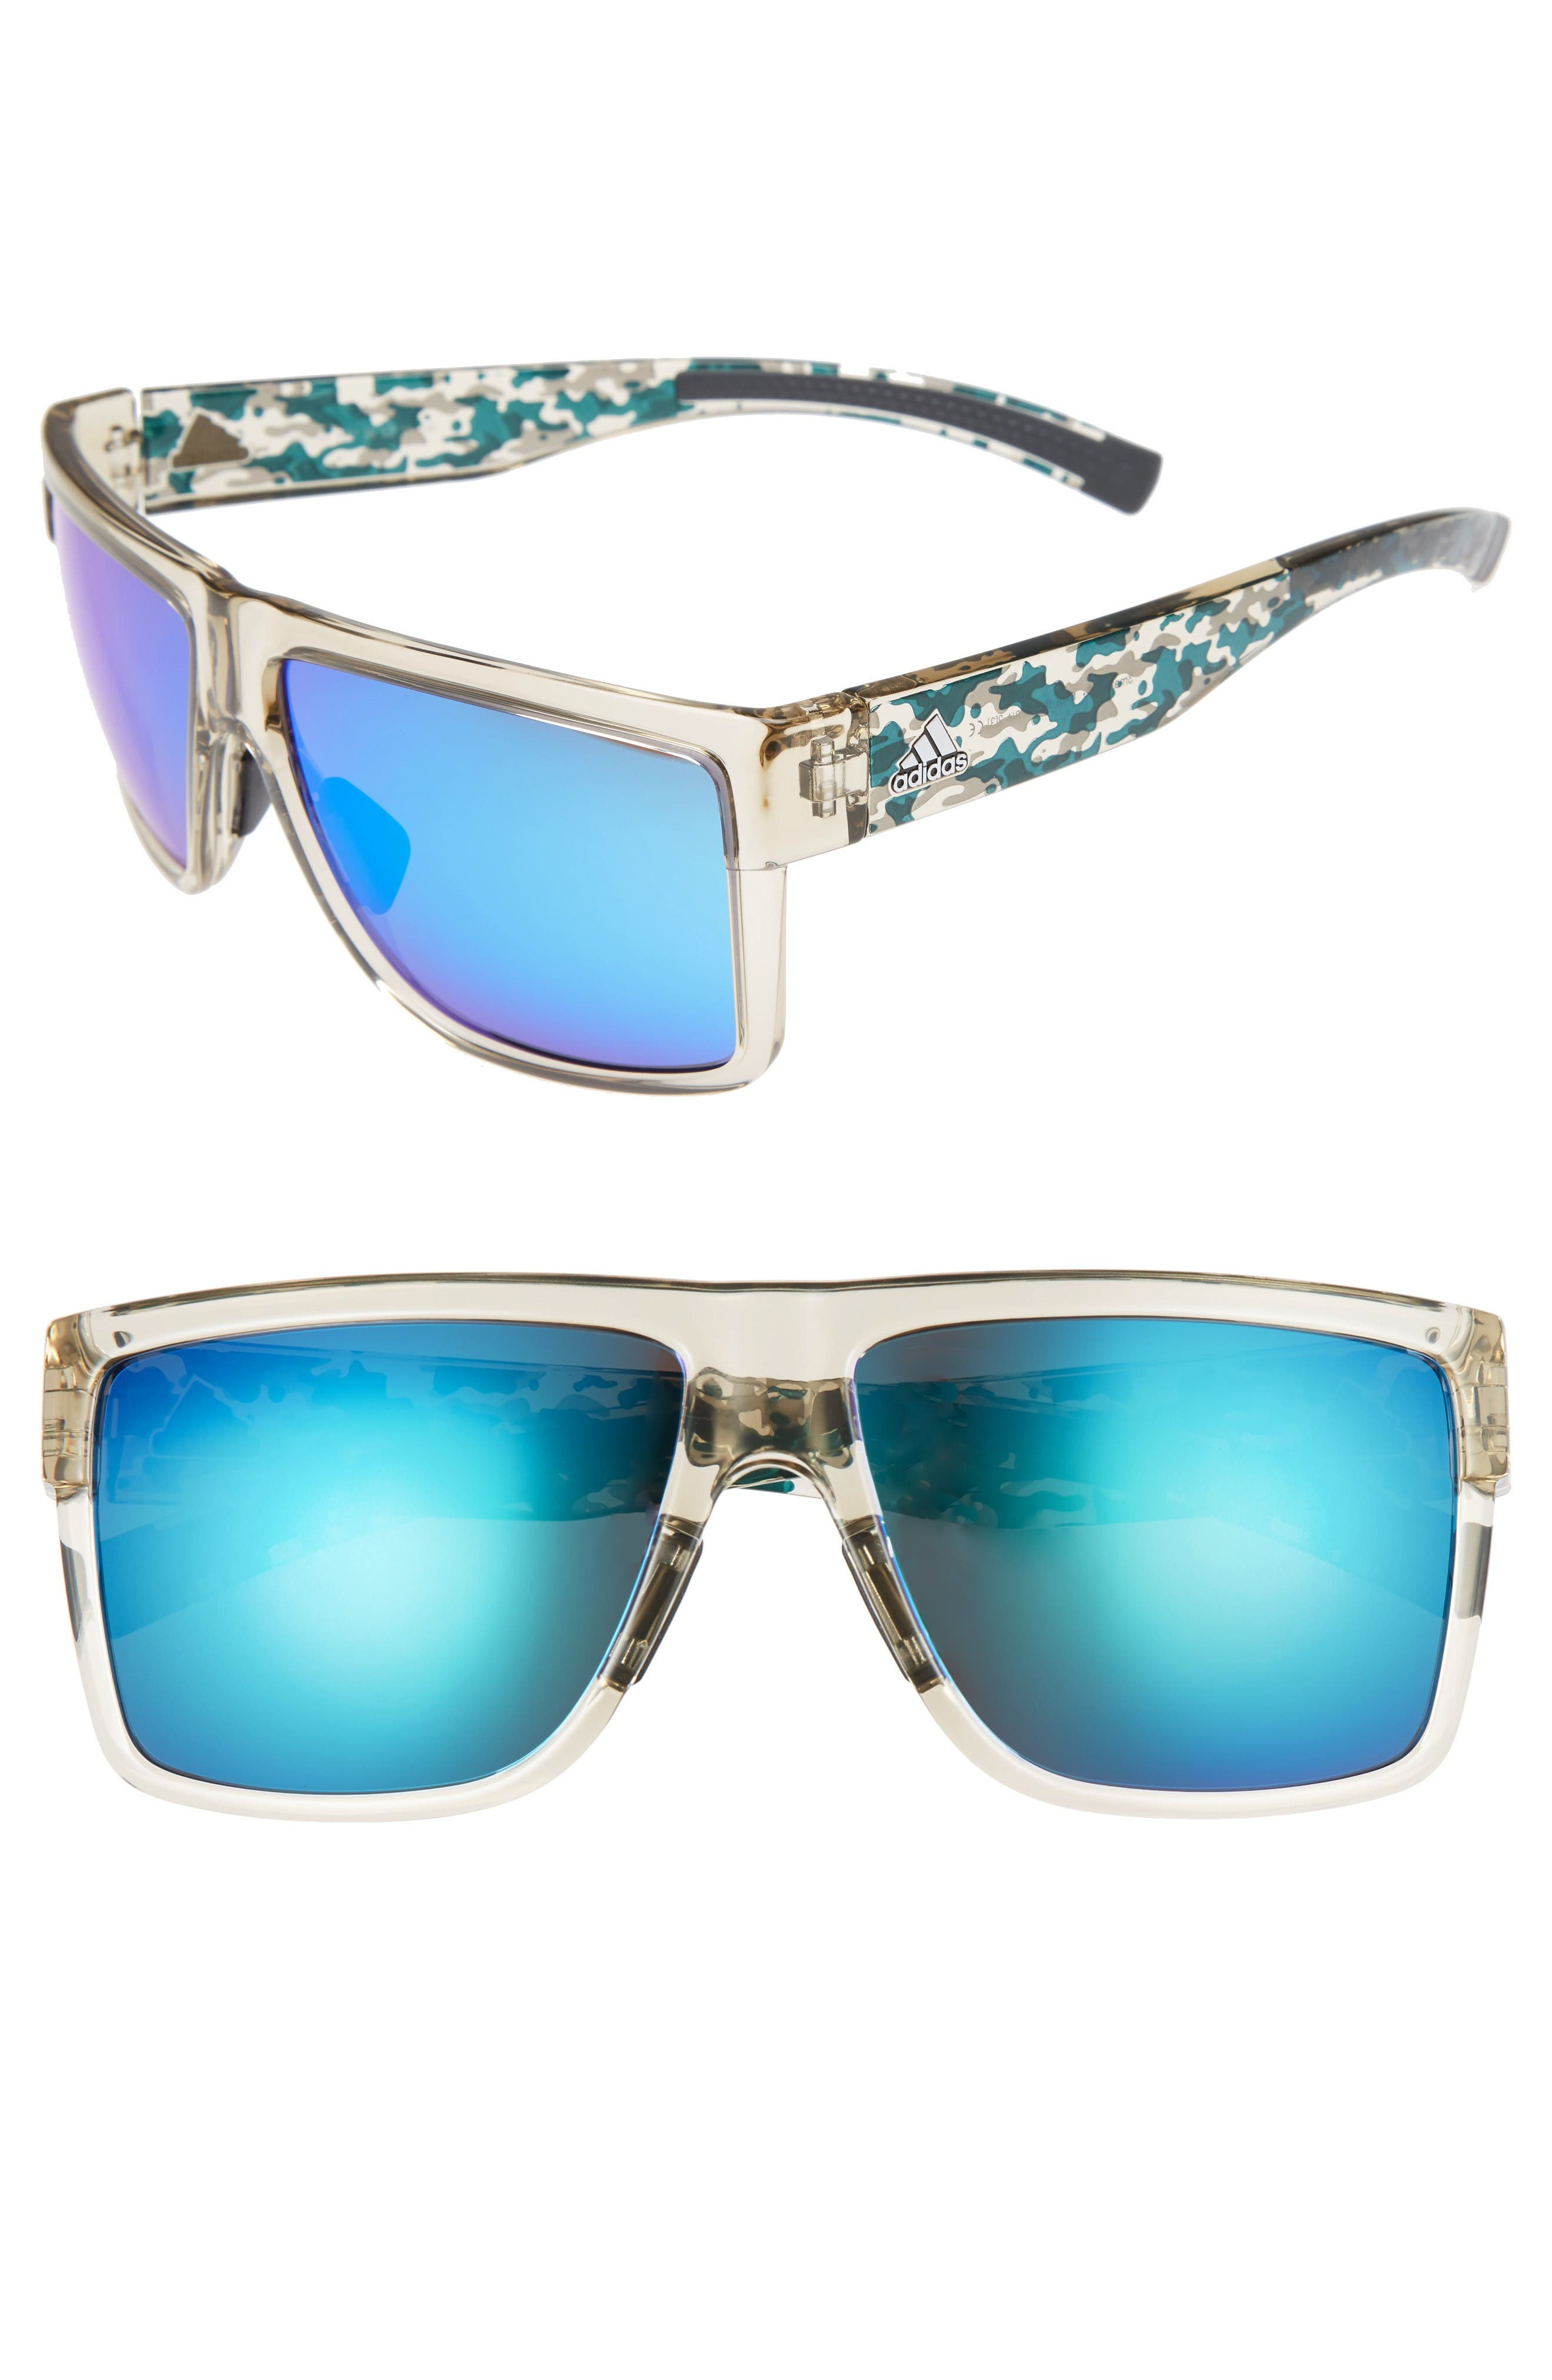 3Matic 60mm Sunglasses,                         Main,                         color, Clear Brown Camo/ Blue Mirror